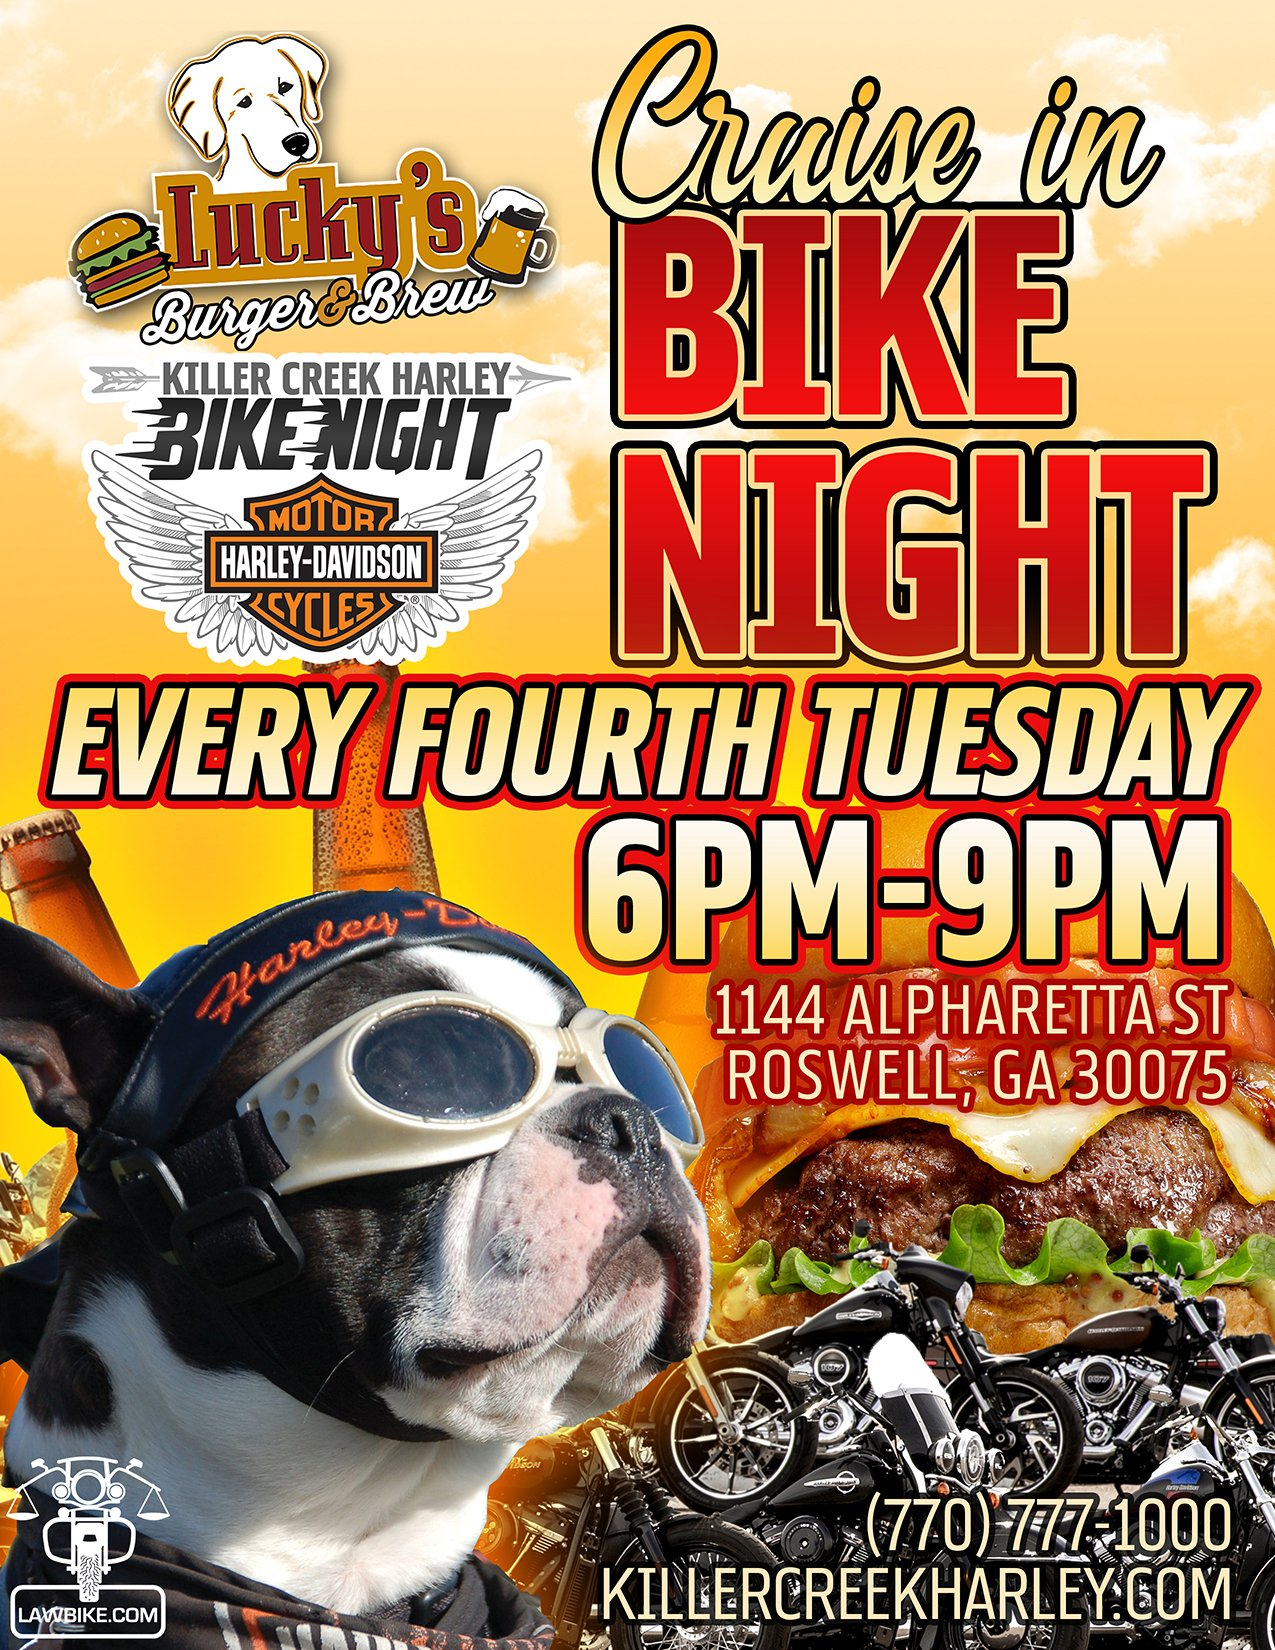 Killer Creek Harley Bike Night | Lucky's Burger & Brew